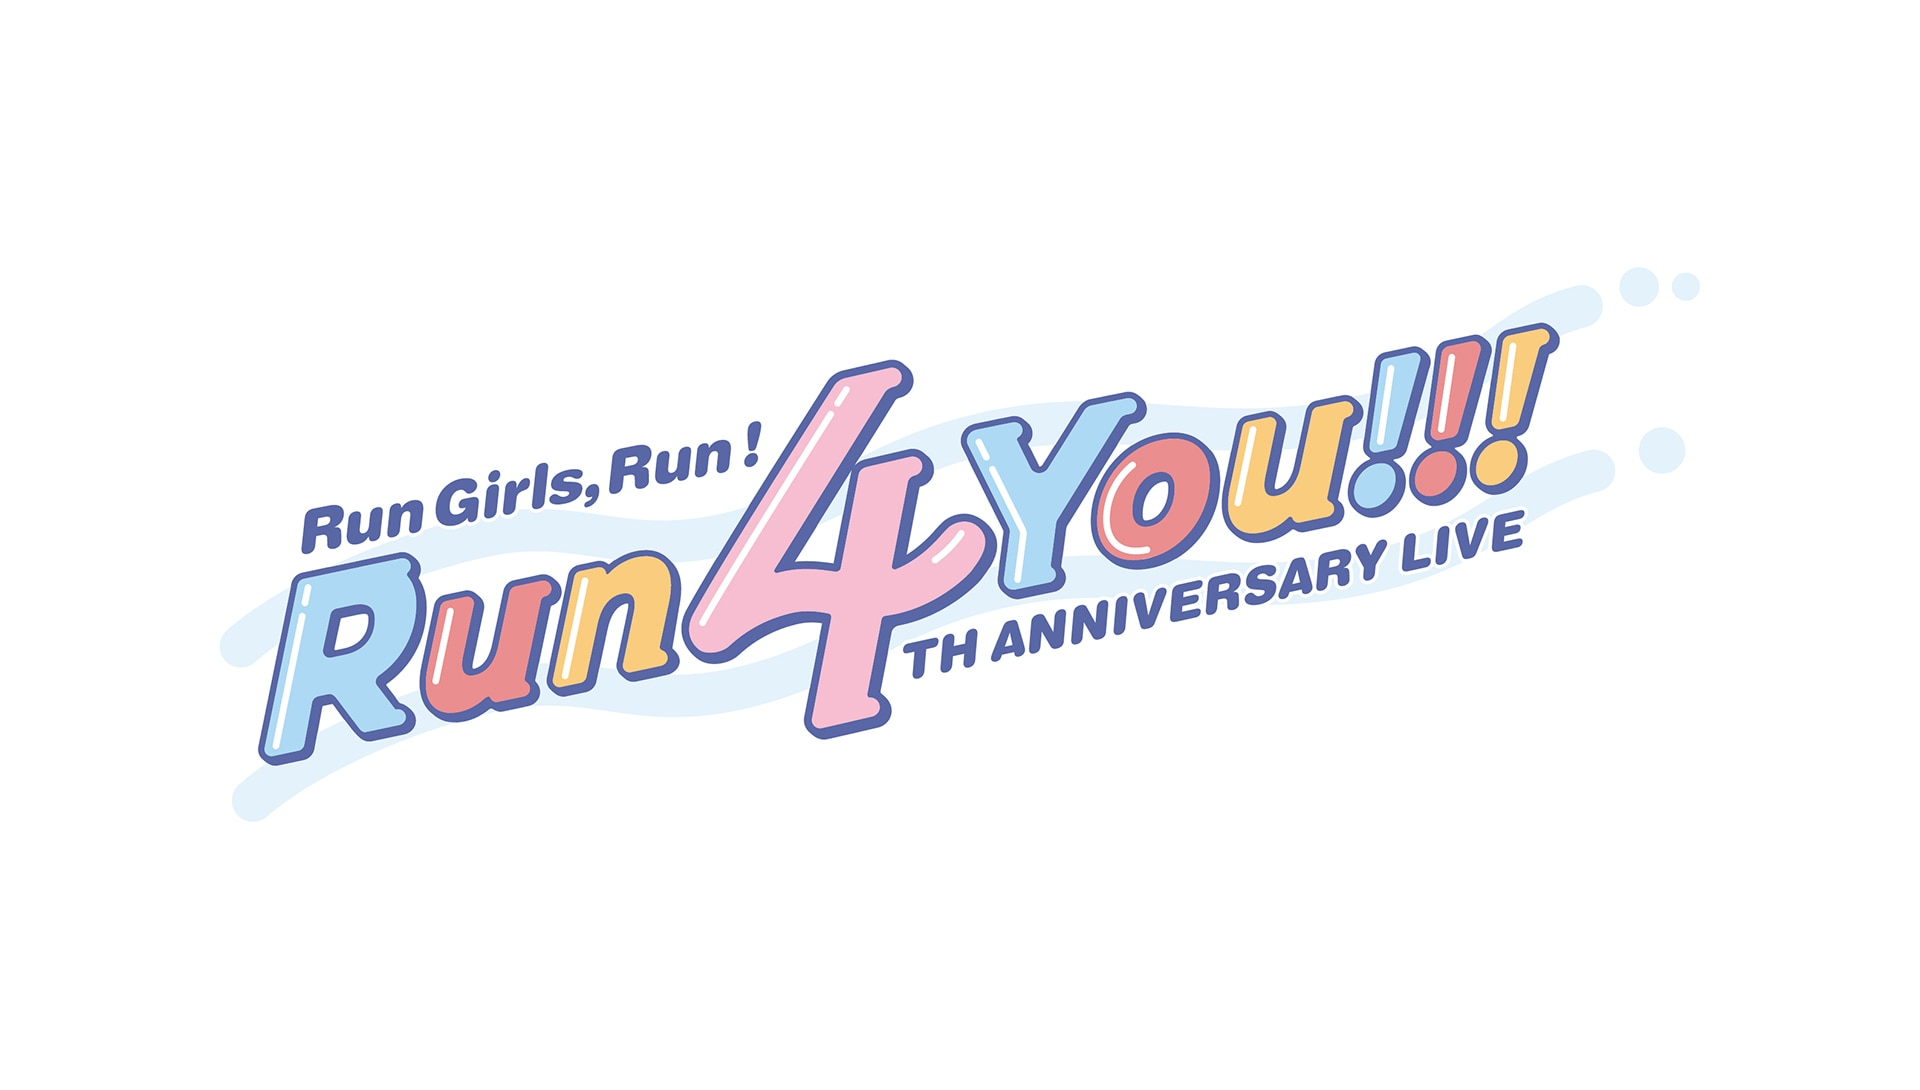 『Run Girls, Run!4th Anniversary LIVE Run 4 You!!!』開催決定!